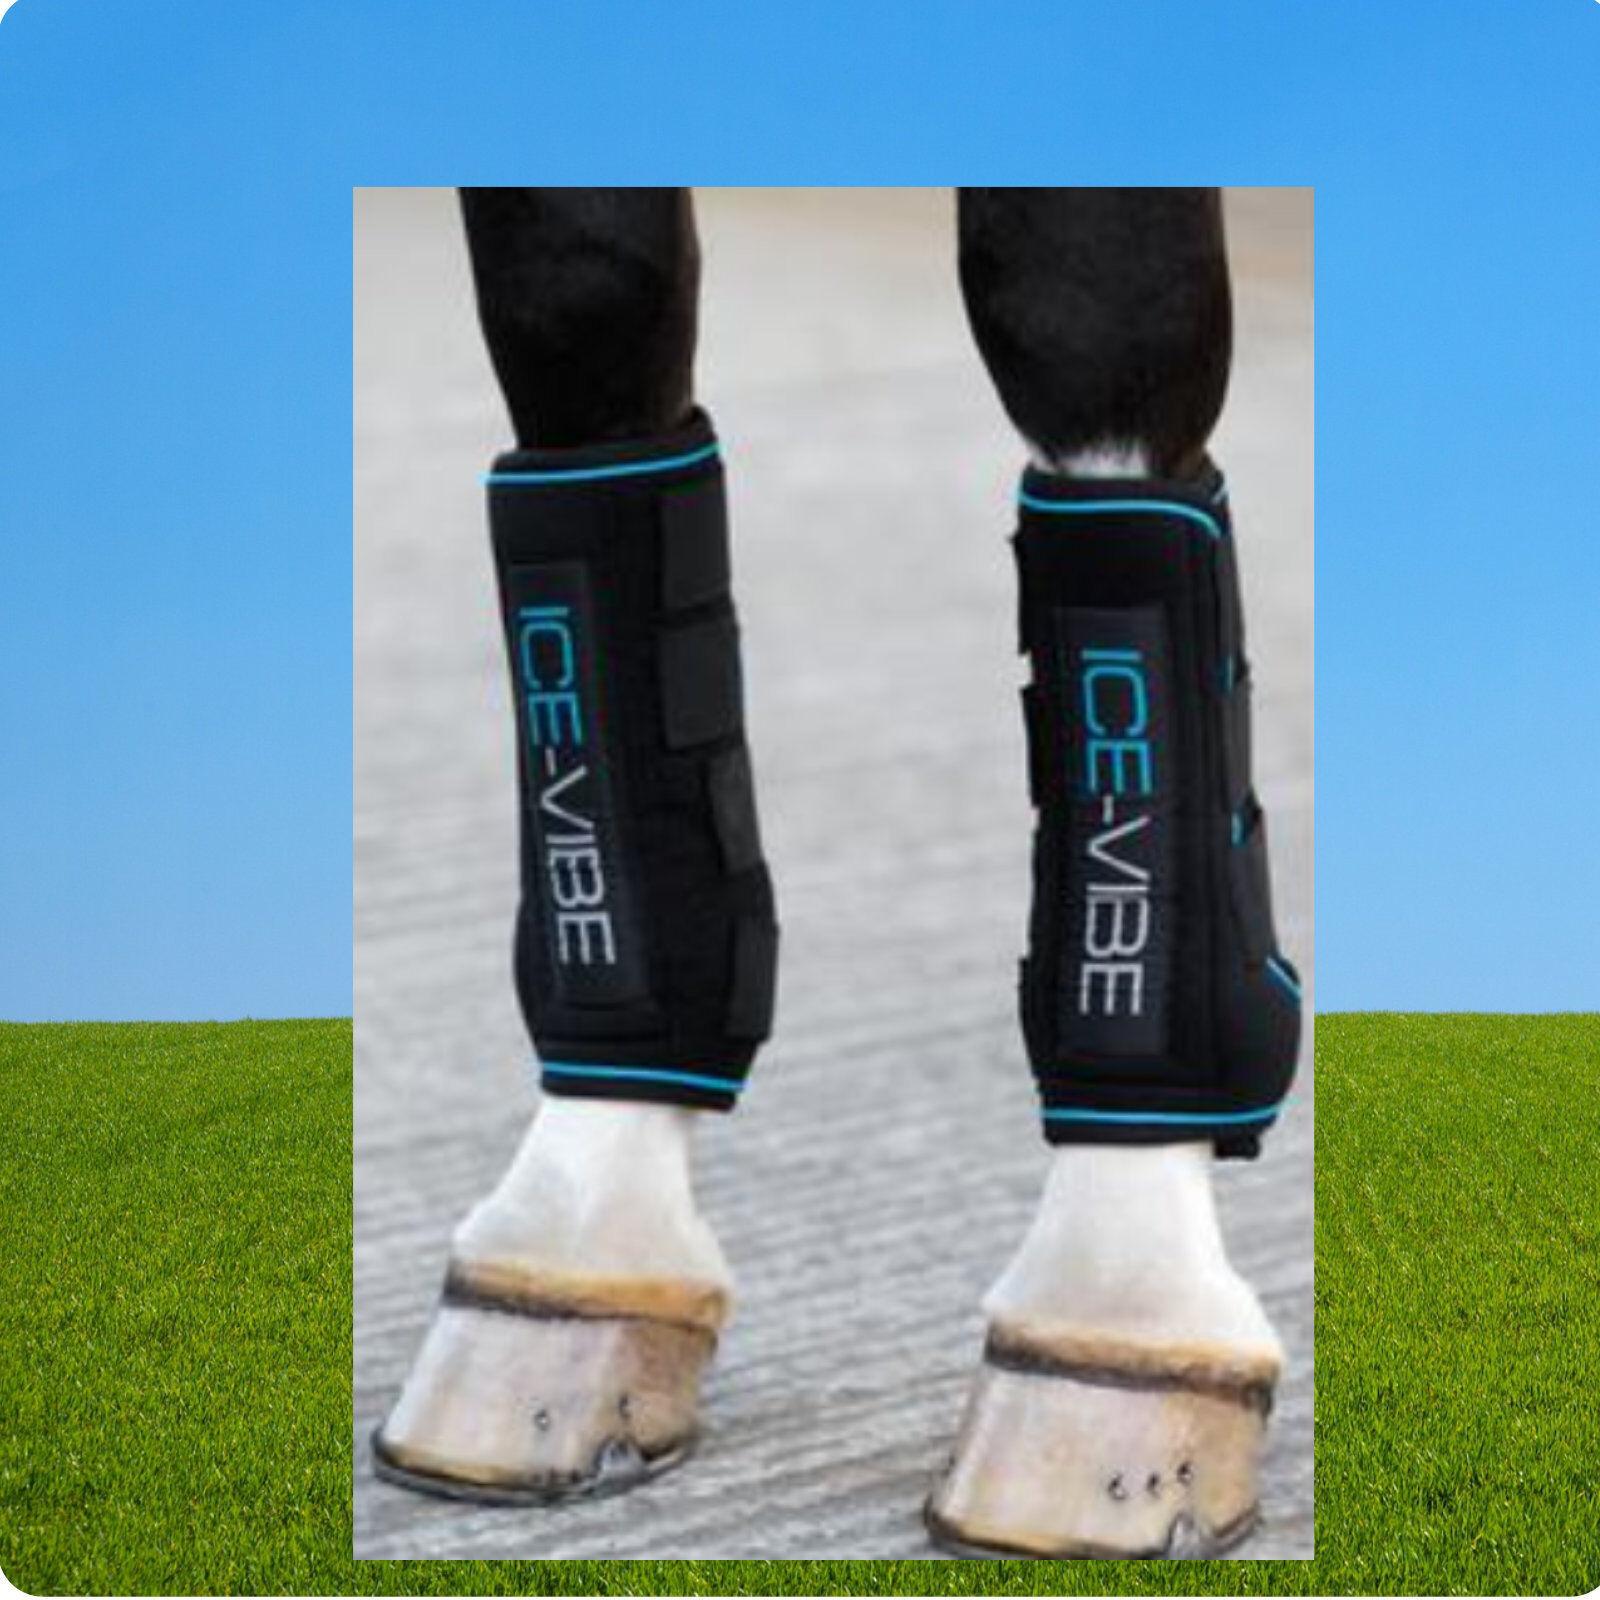 Ice-Vibe Kühlgamaschen mit Vibration, Horseware Ice Vibe Boots, Sehnenschäden